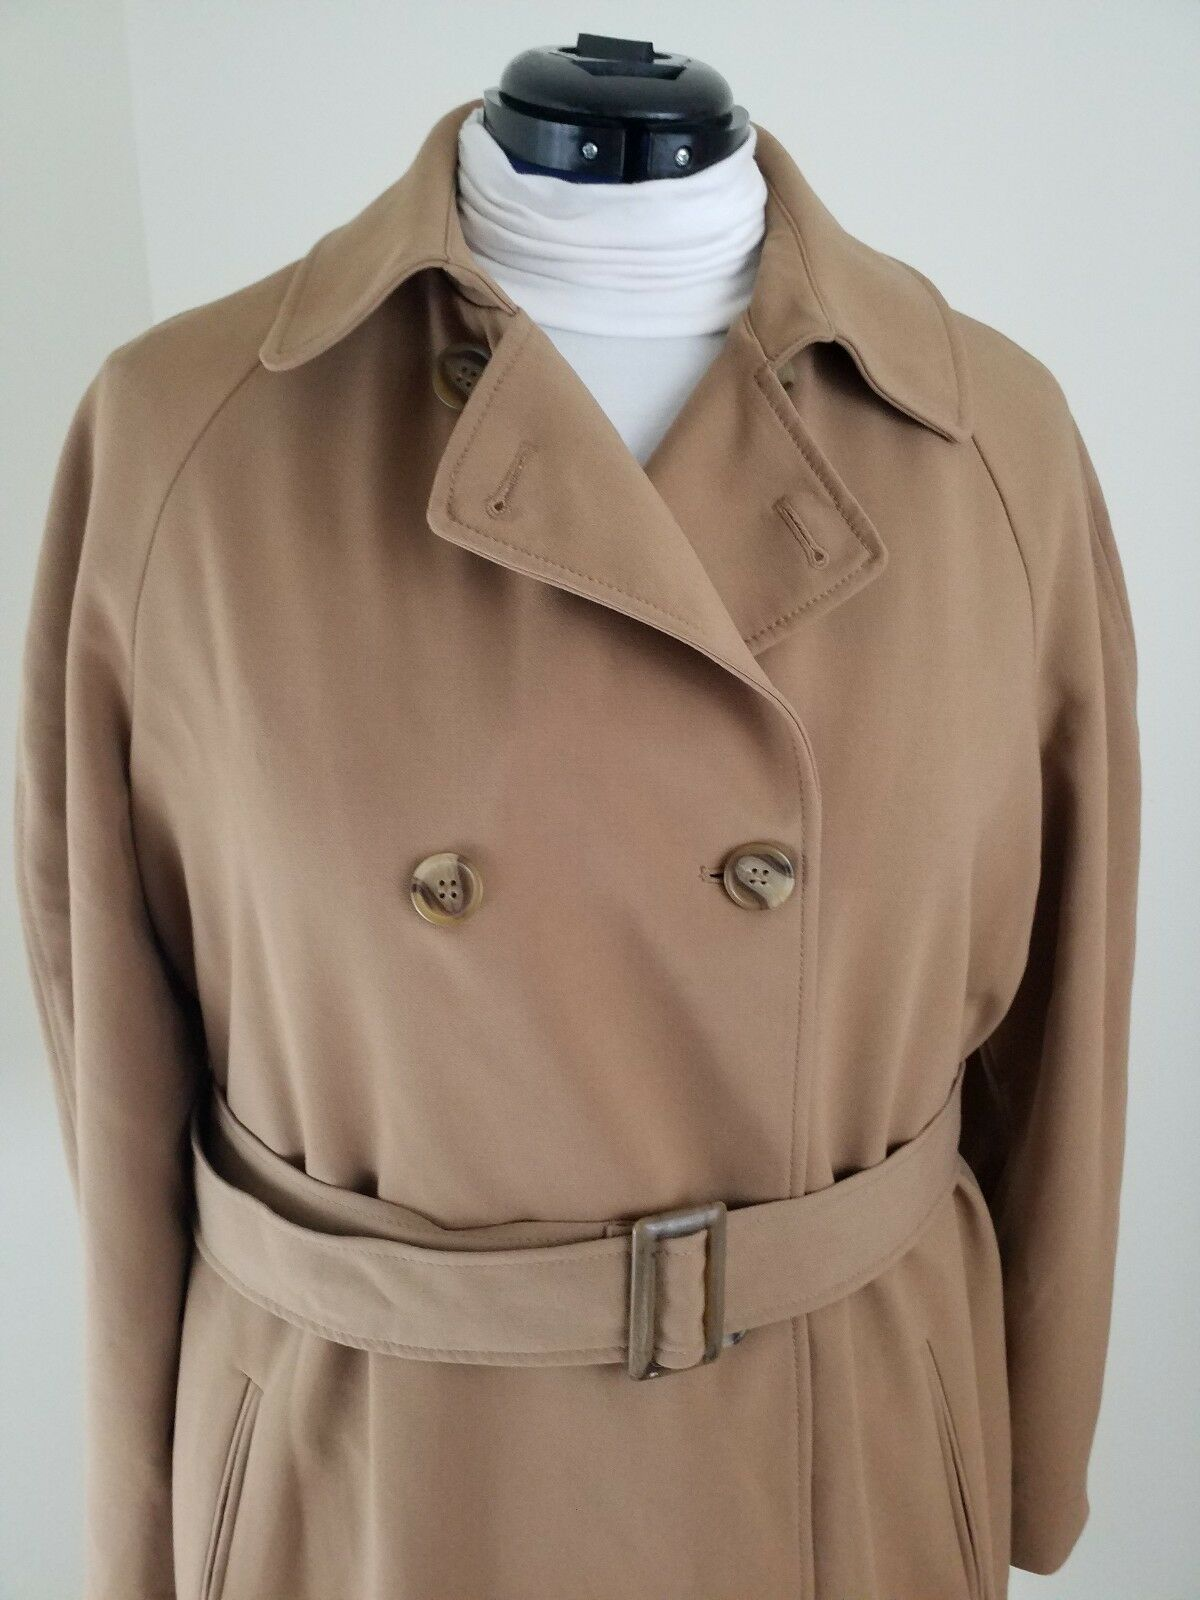 Charter Club  WomanPlus Size 16WSalty Nut Nut Nut Long Raincoat Trench NWT  169.50 9e76f8